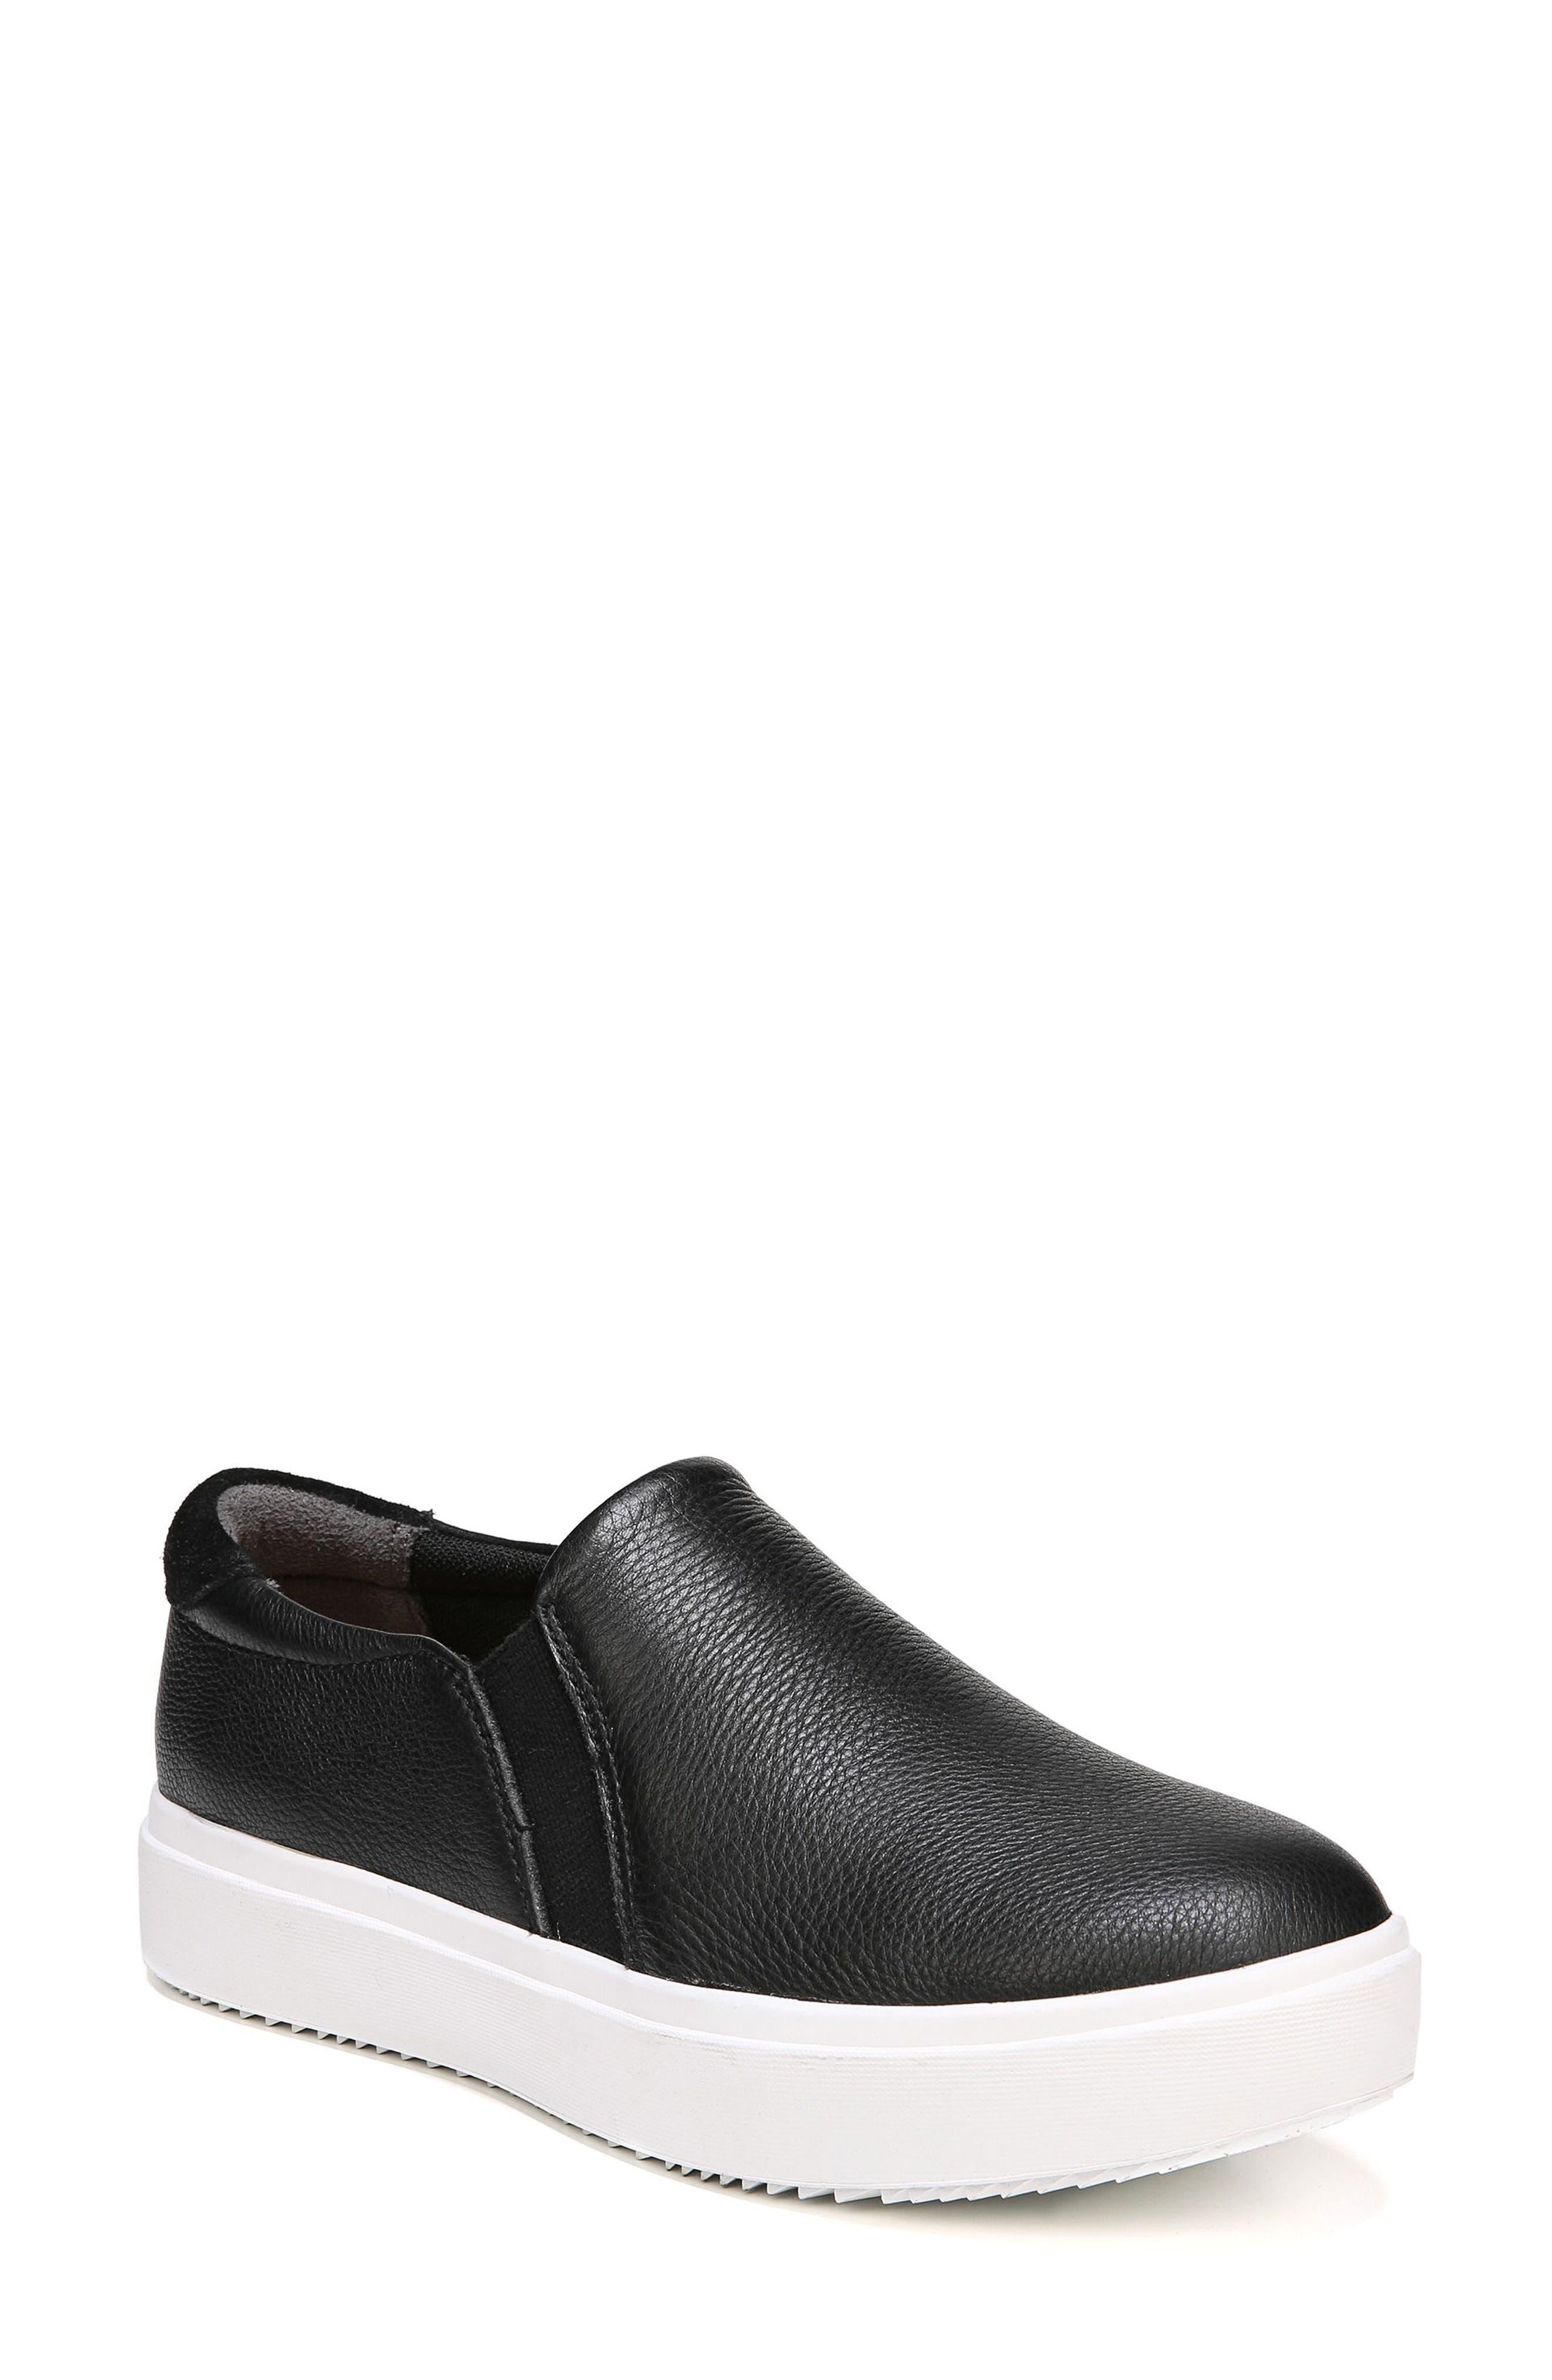 DR. SCHOLL'S Leta Slip-On Sneaker, Main, color, BLACK LEATHER